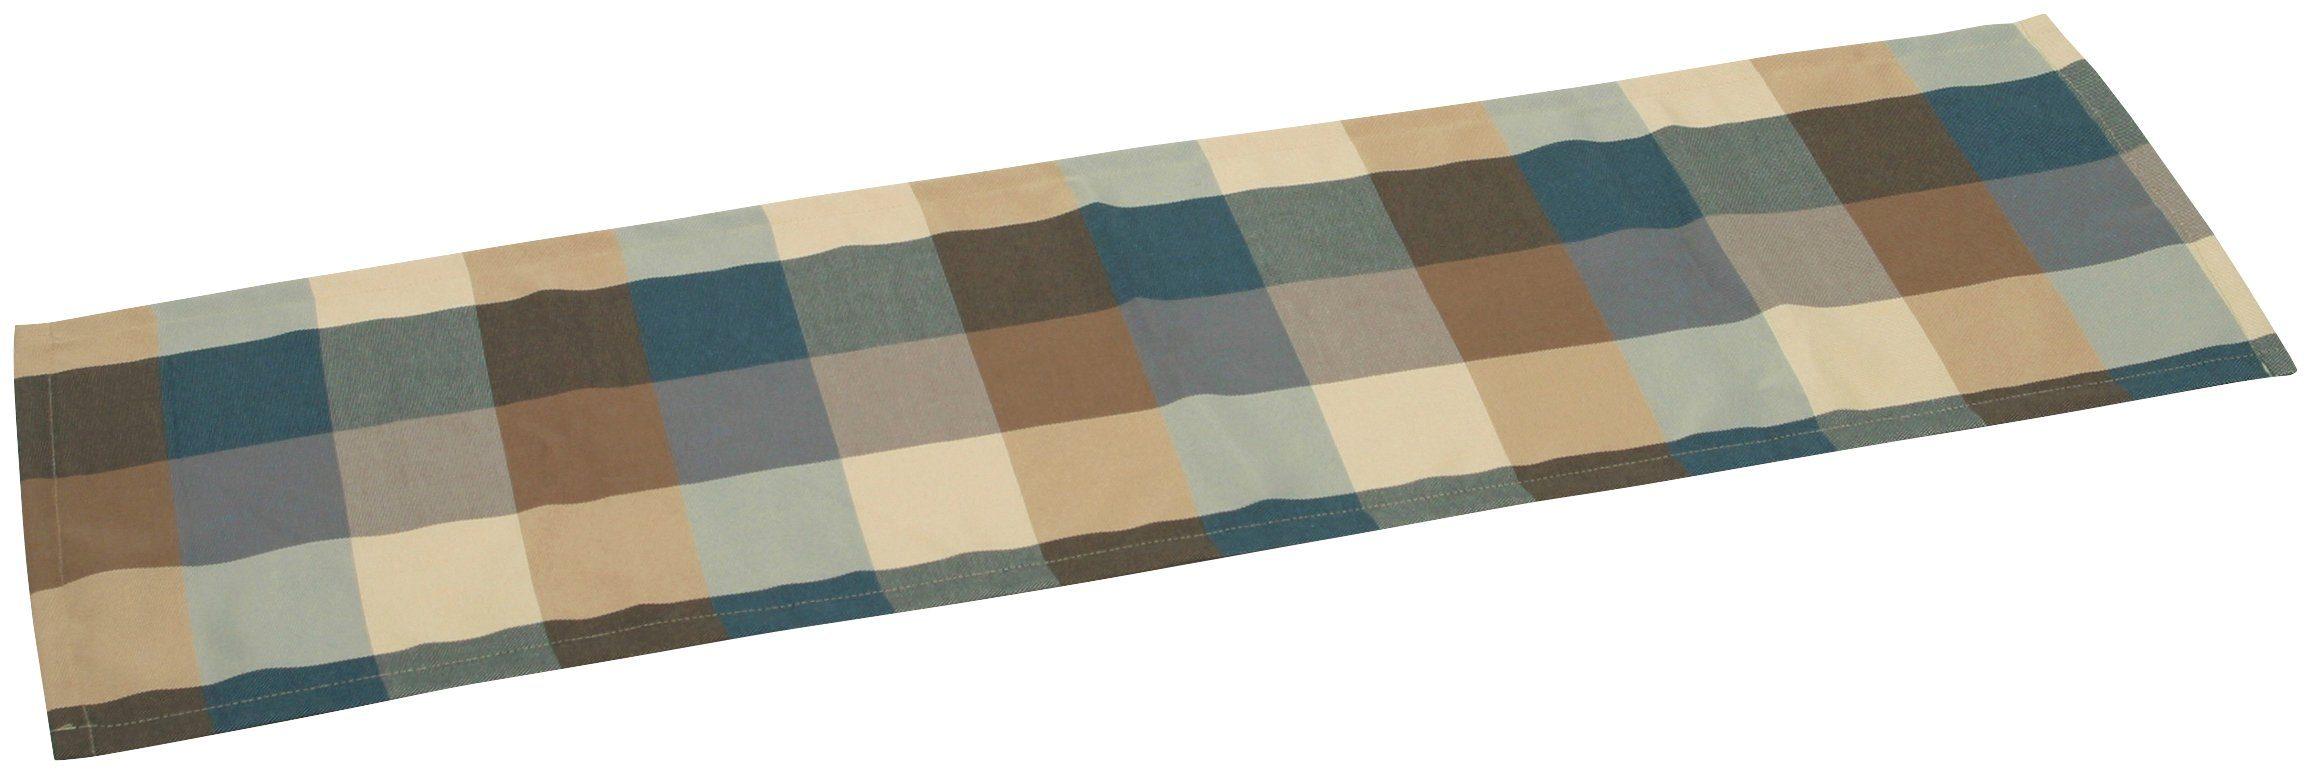 GO-DE Tischläufer , (L/B): ca. 140x40 cm